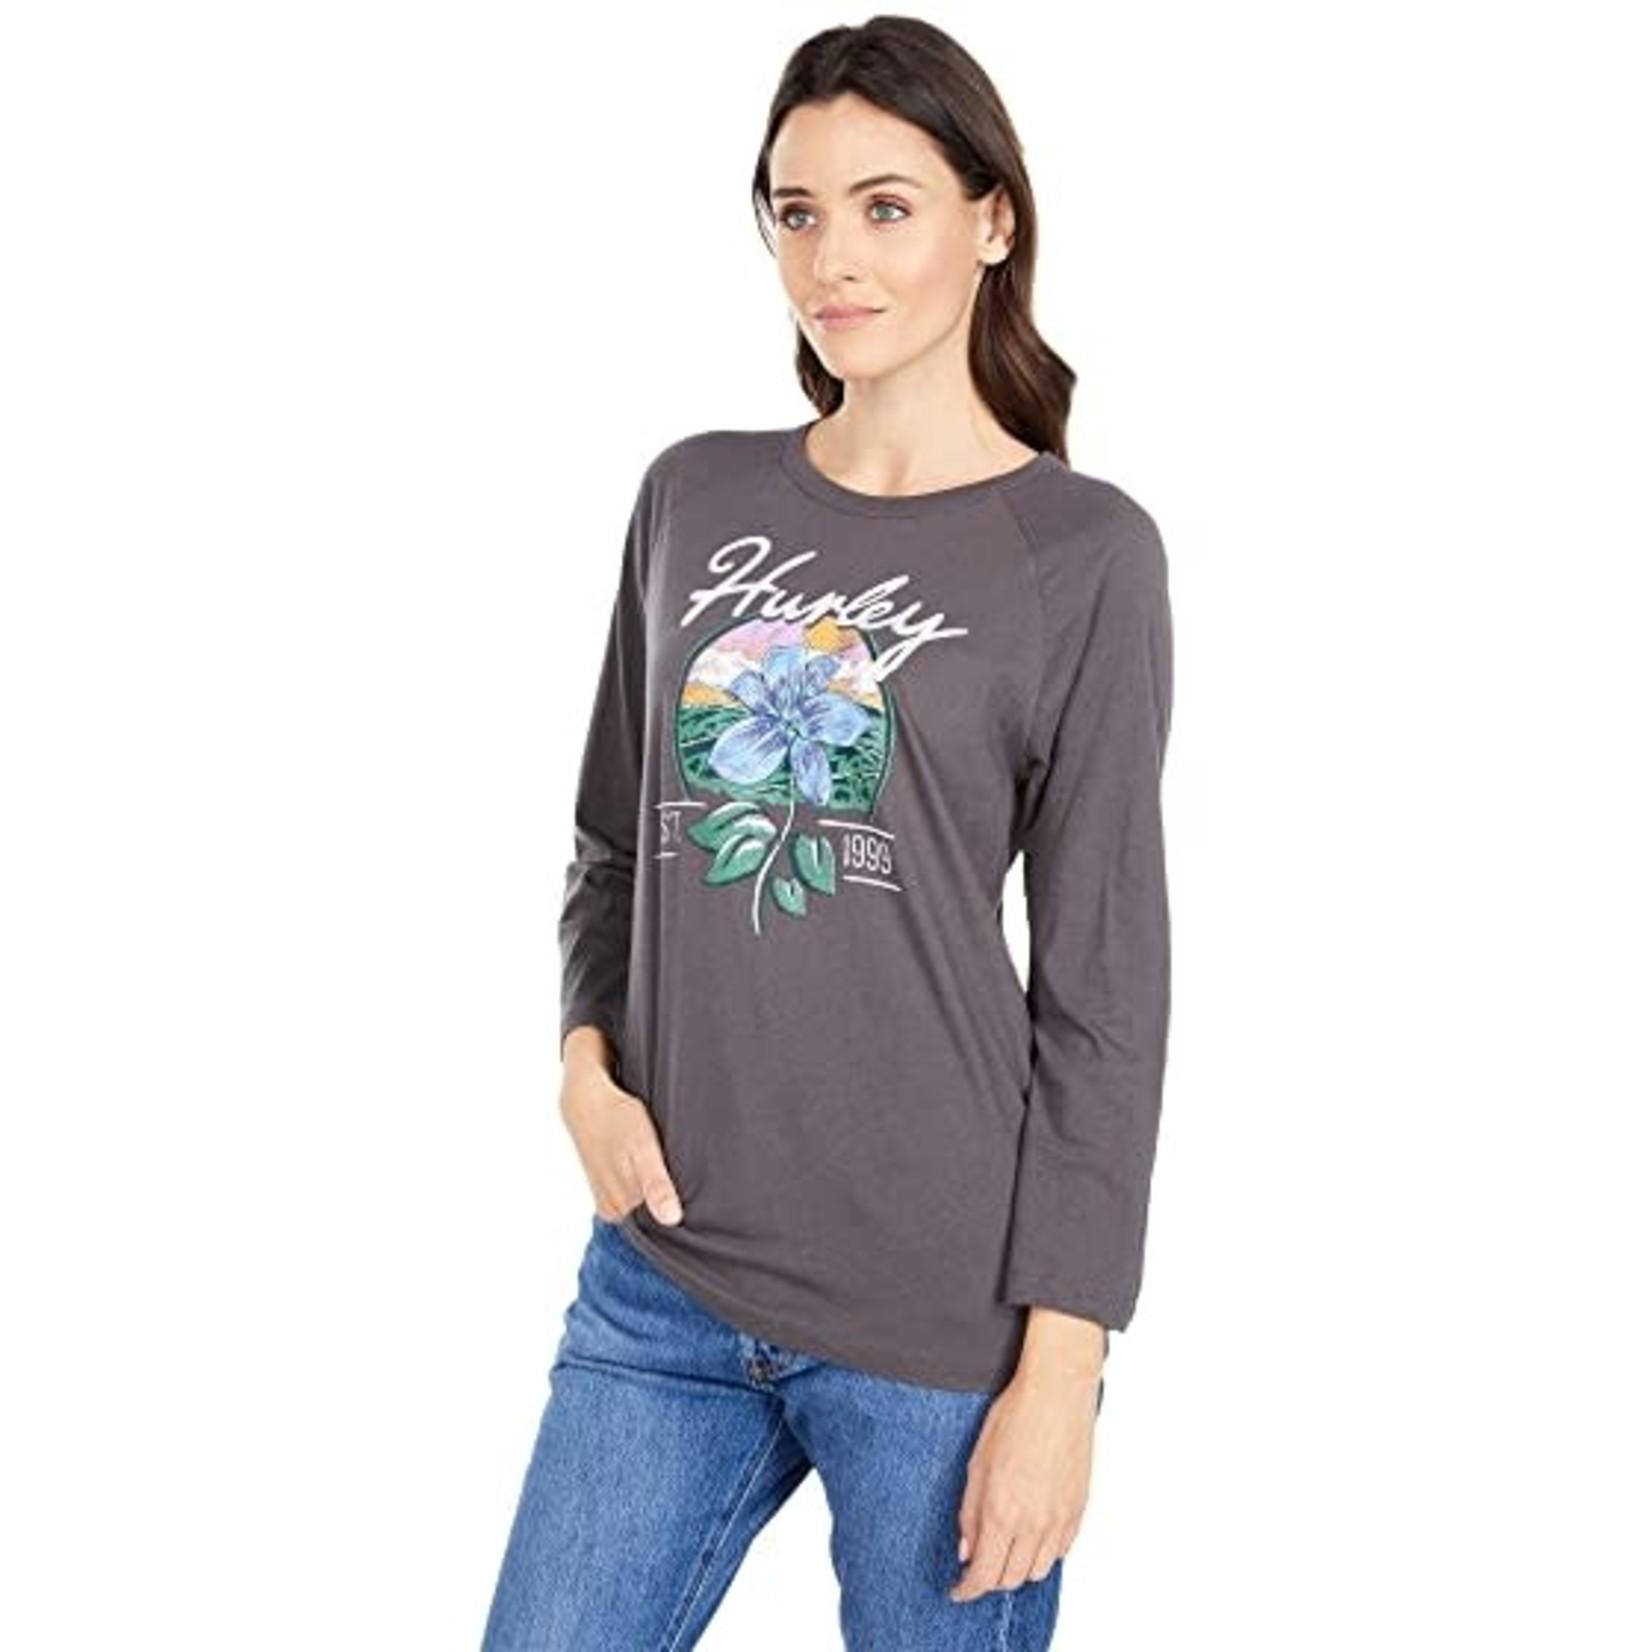 Hurley Hurley 3/4 Sleeve T-Shirt, Leila Raglan, Ladies